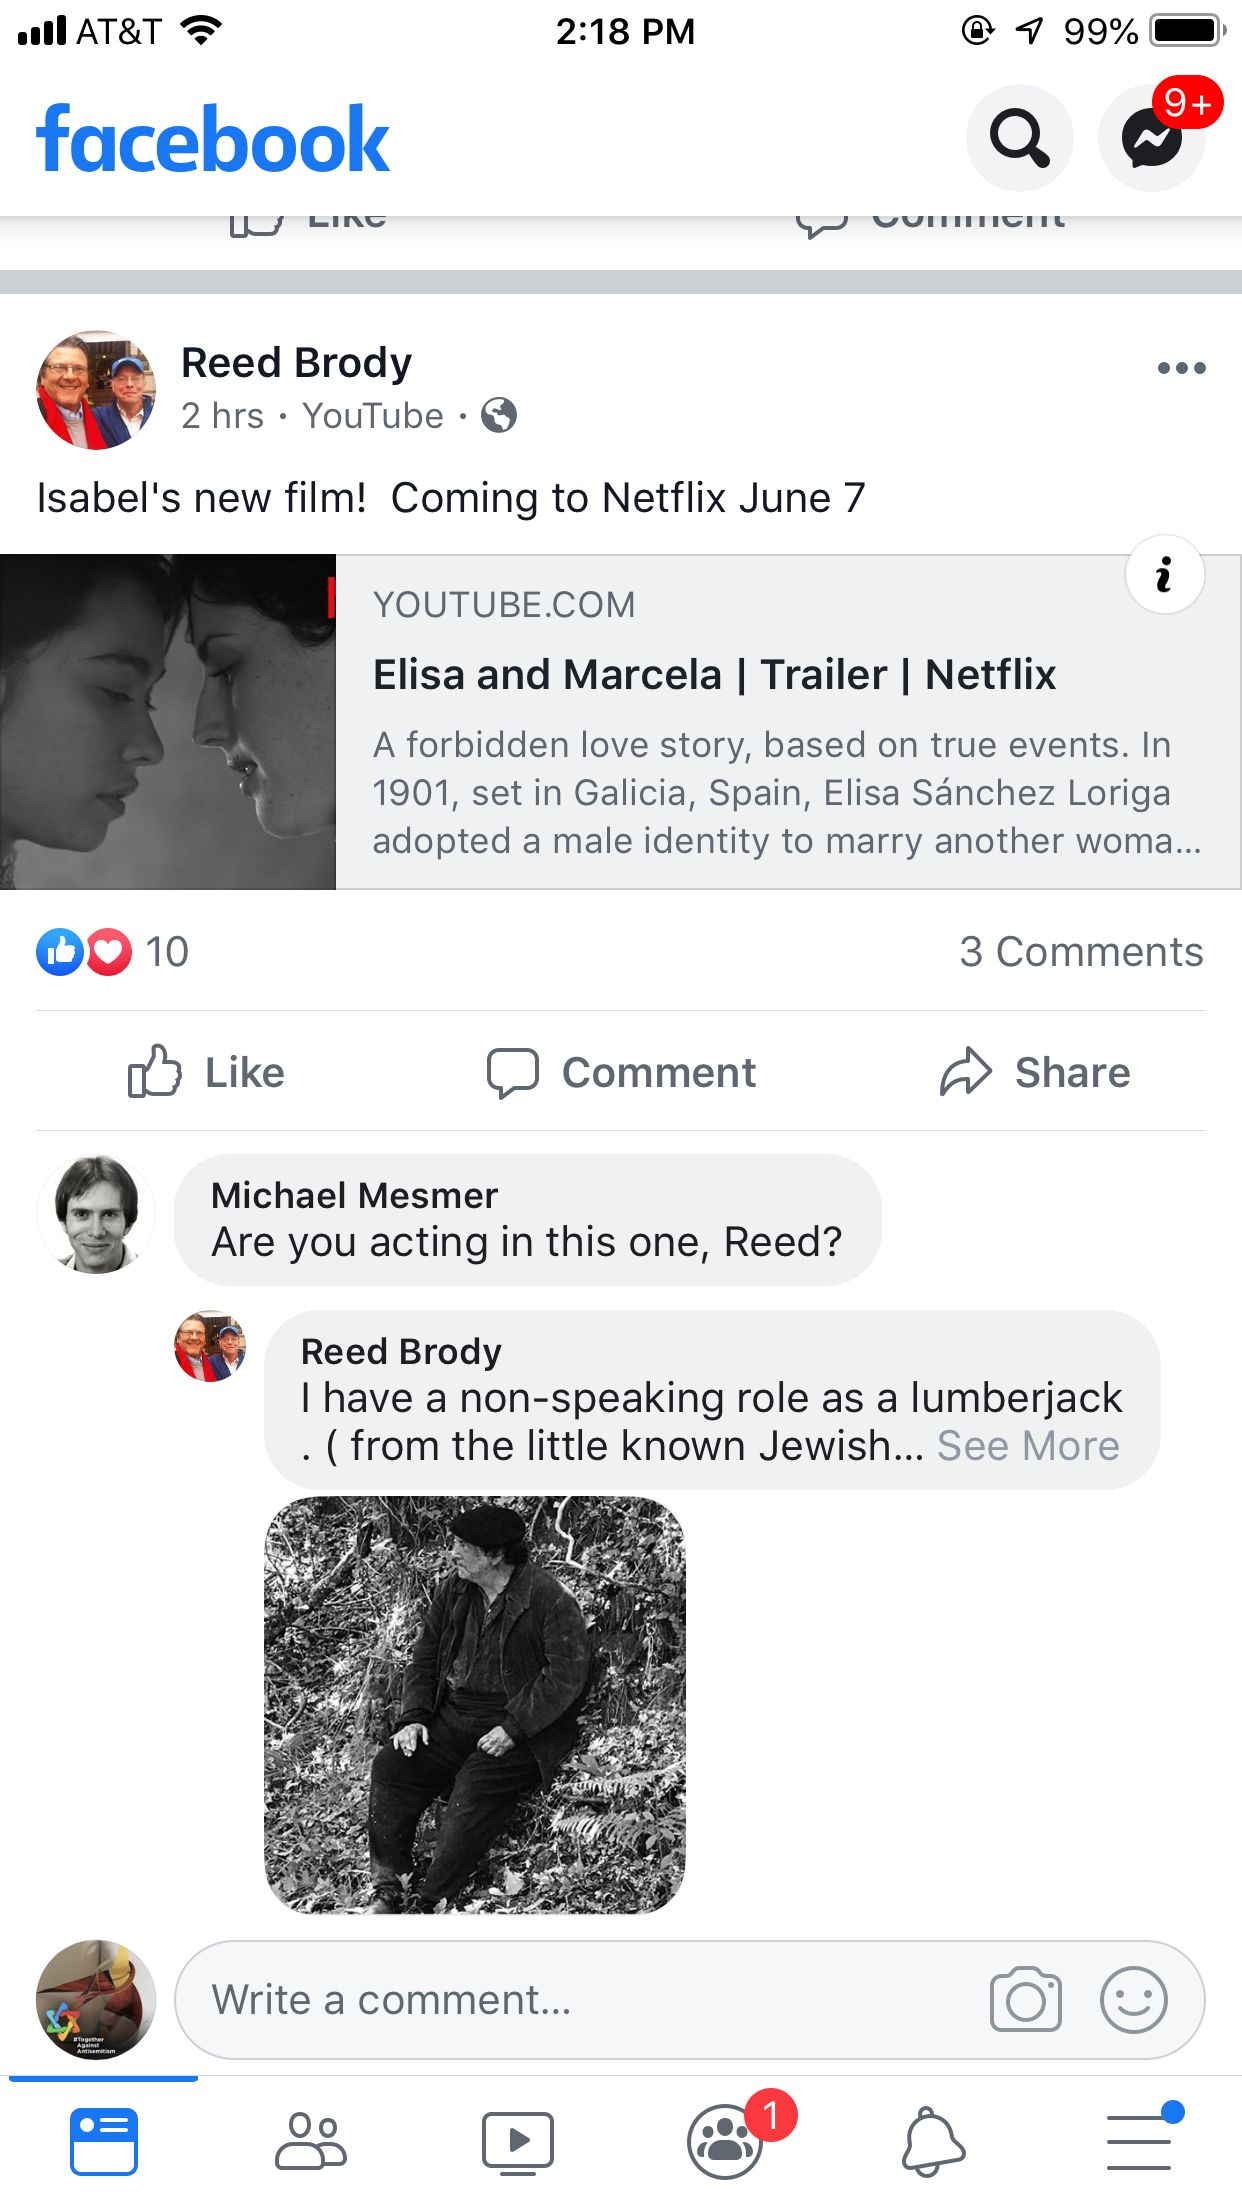 Isabel's film Forbidden love, Netflix, Love story